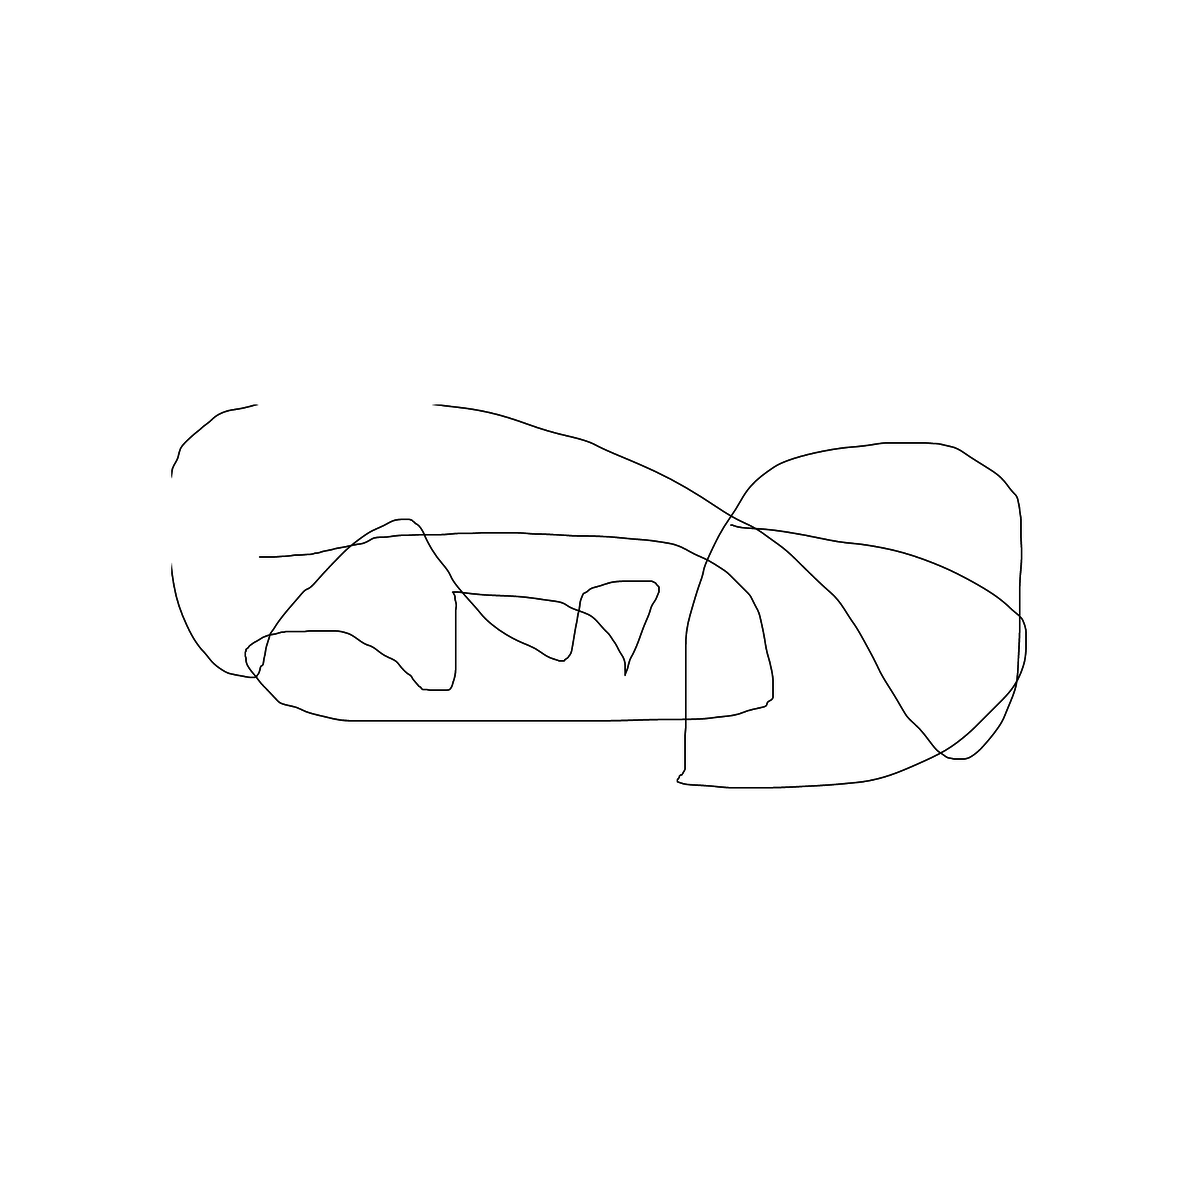 BAAAM drawing#6376 lat:63.4897689819335940lng: -47.4060134887695300